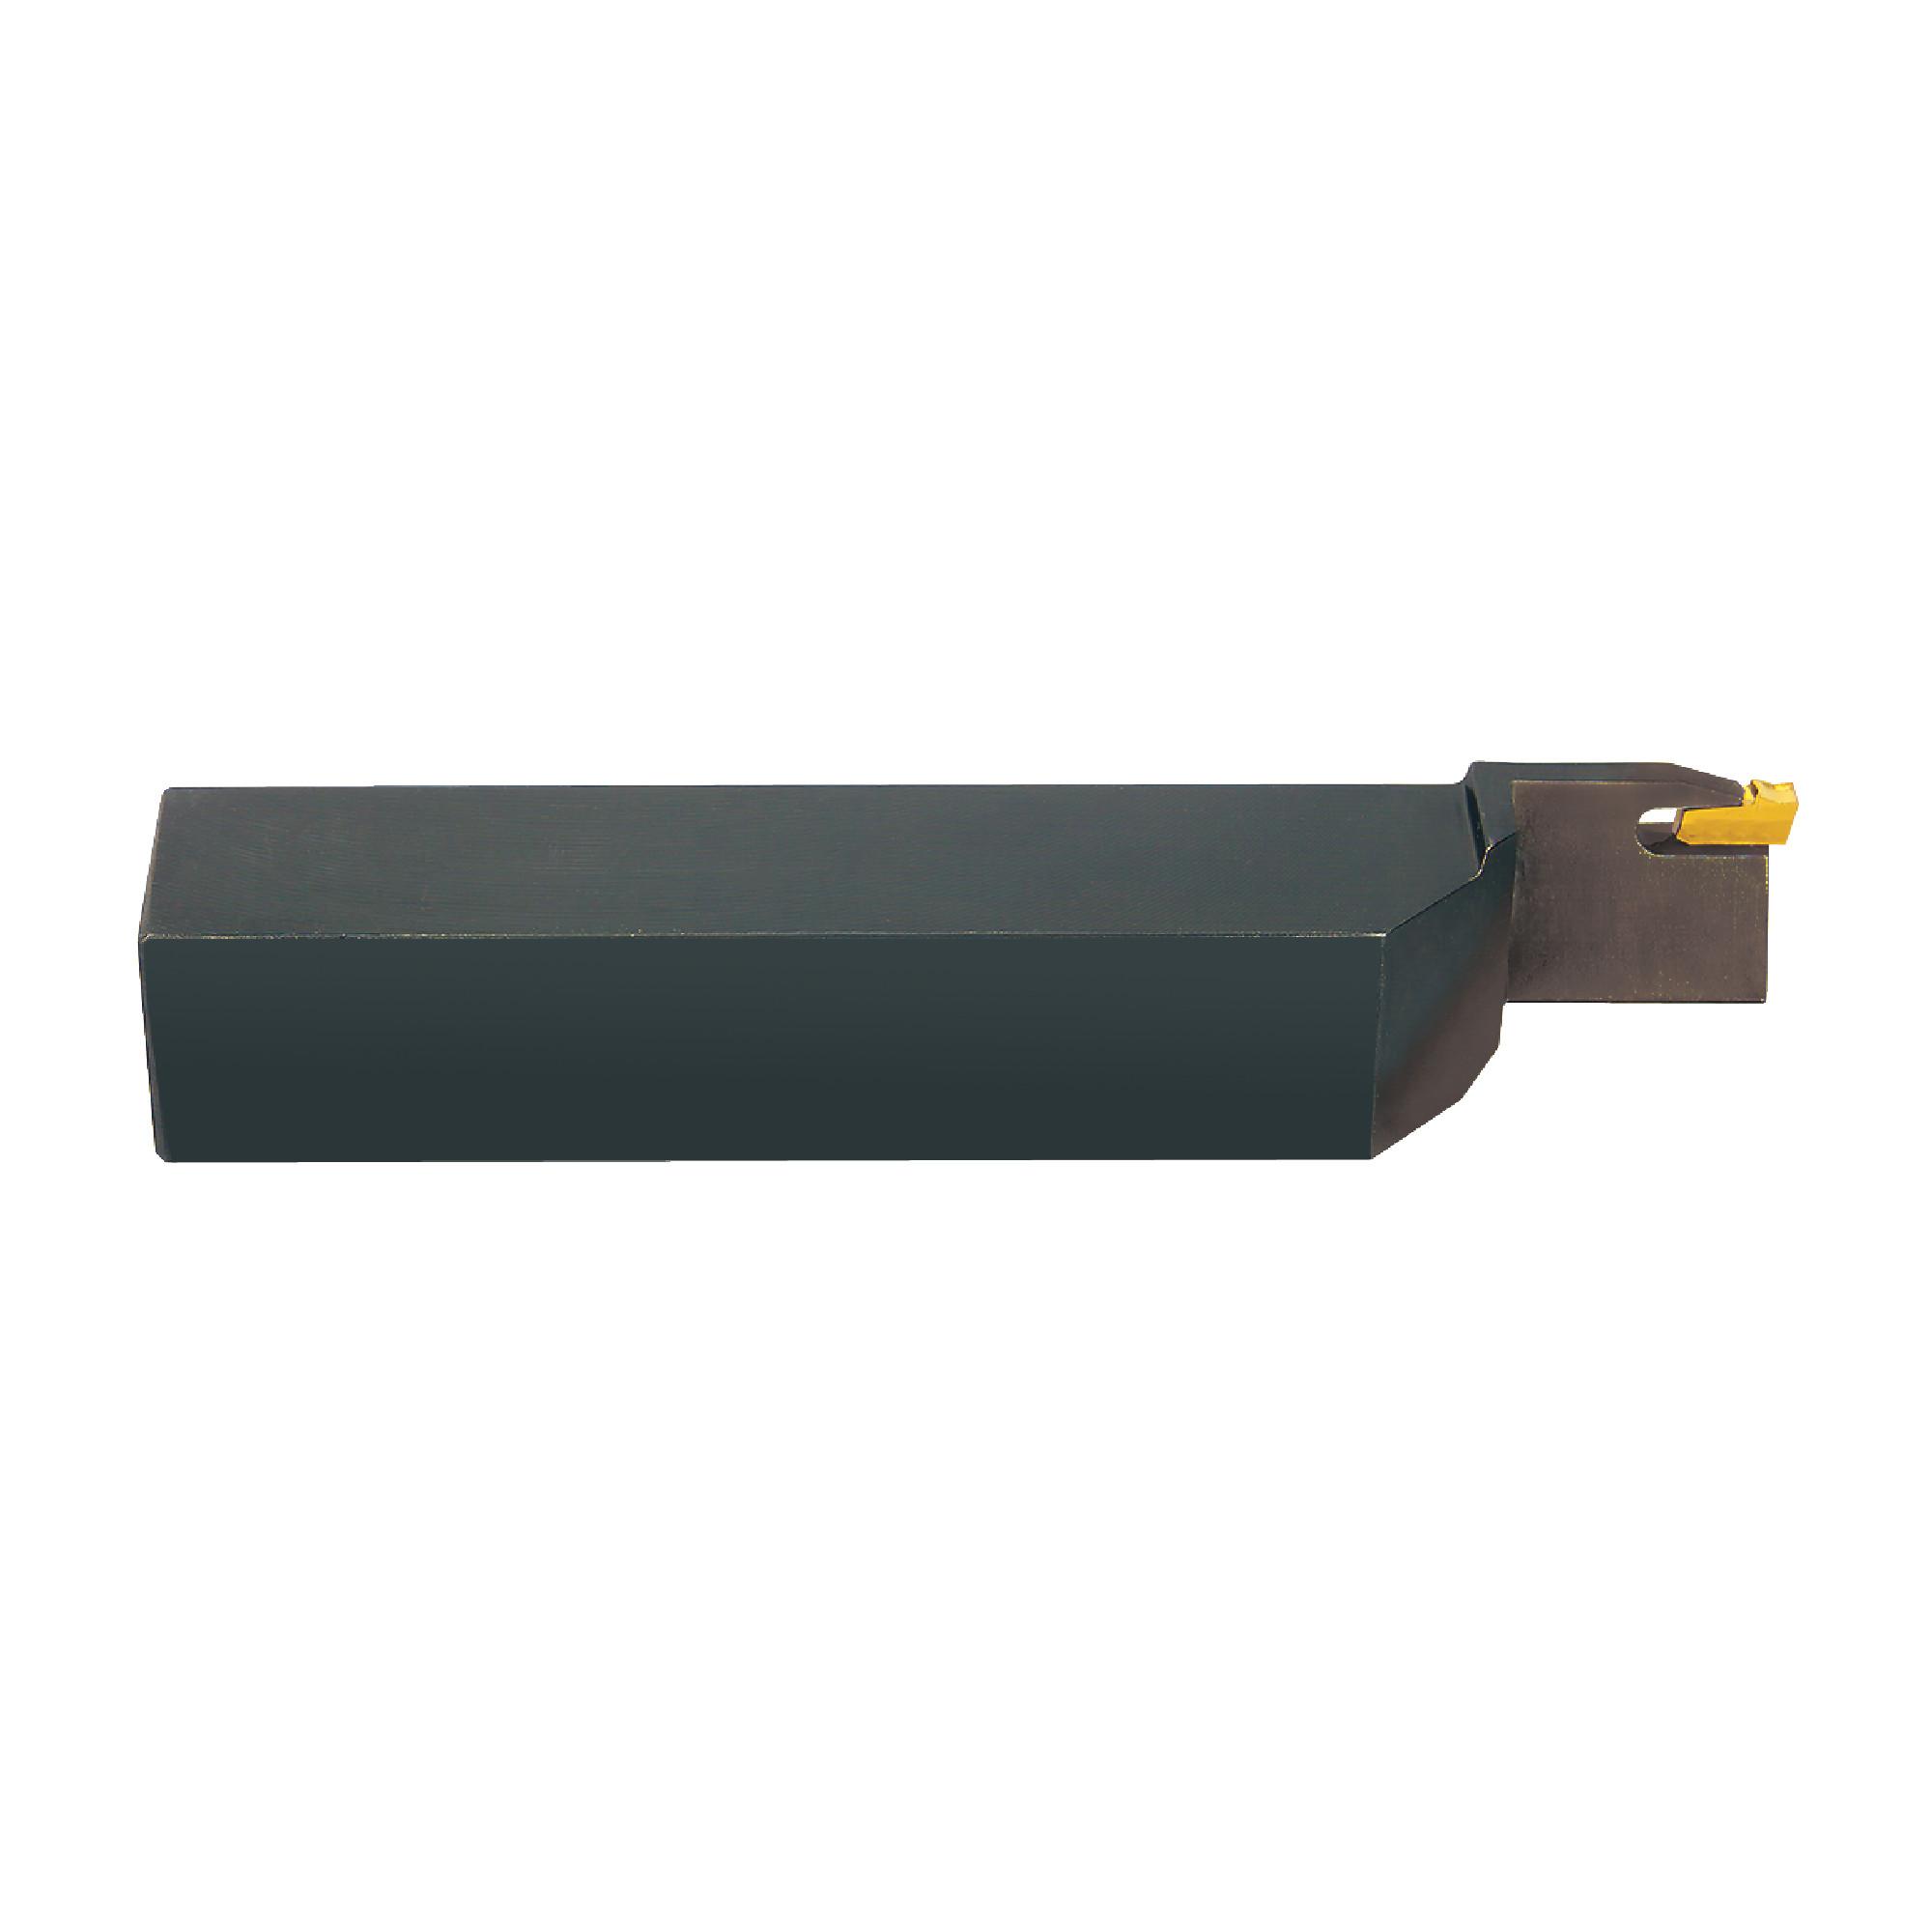 ISCAR - SGFFR 20-30-3 / 20mm Shank / External Monoblock Holder for Face Grooving / GFF 3R/L Self-Grip Inserts / Right Ha